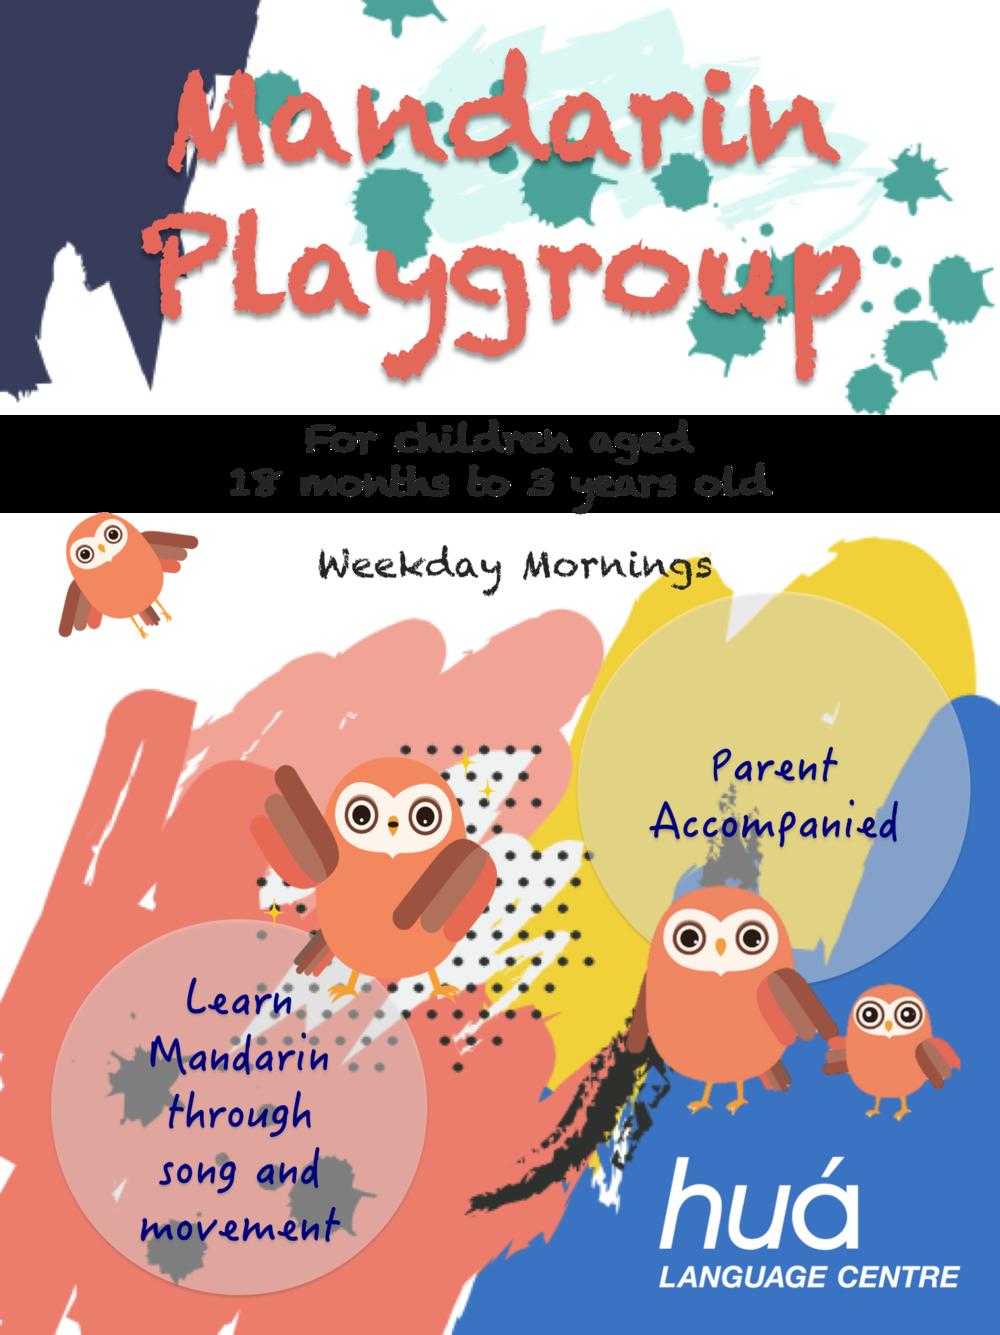 hua_language_mandarin_playgroup.png